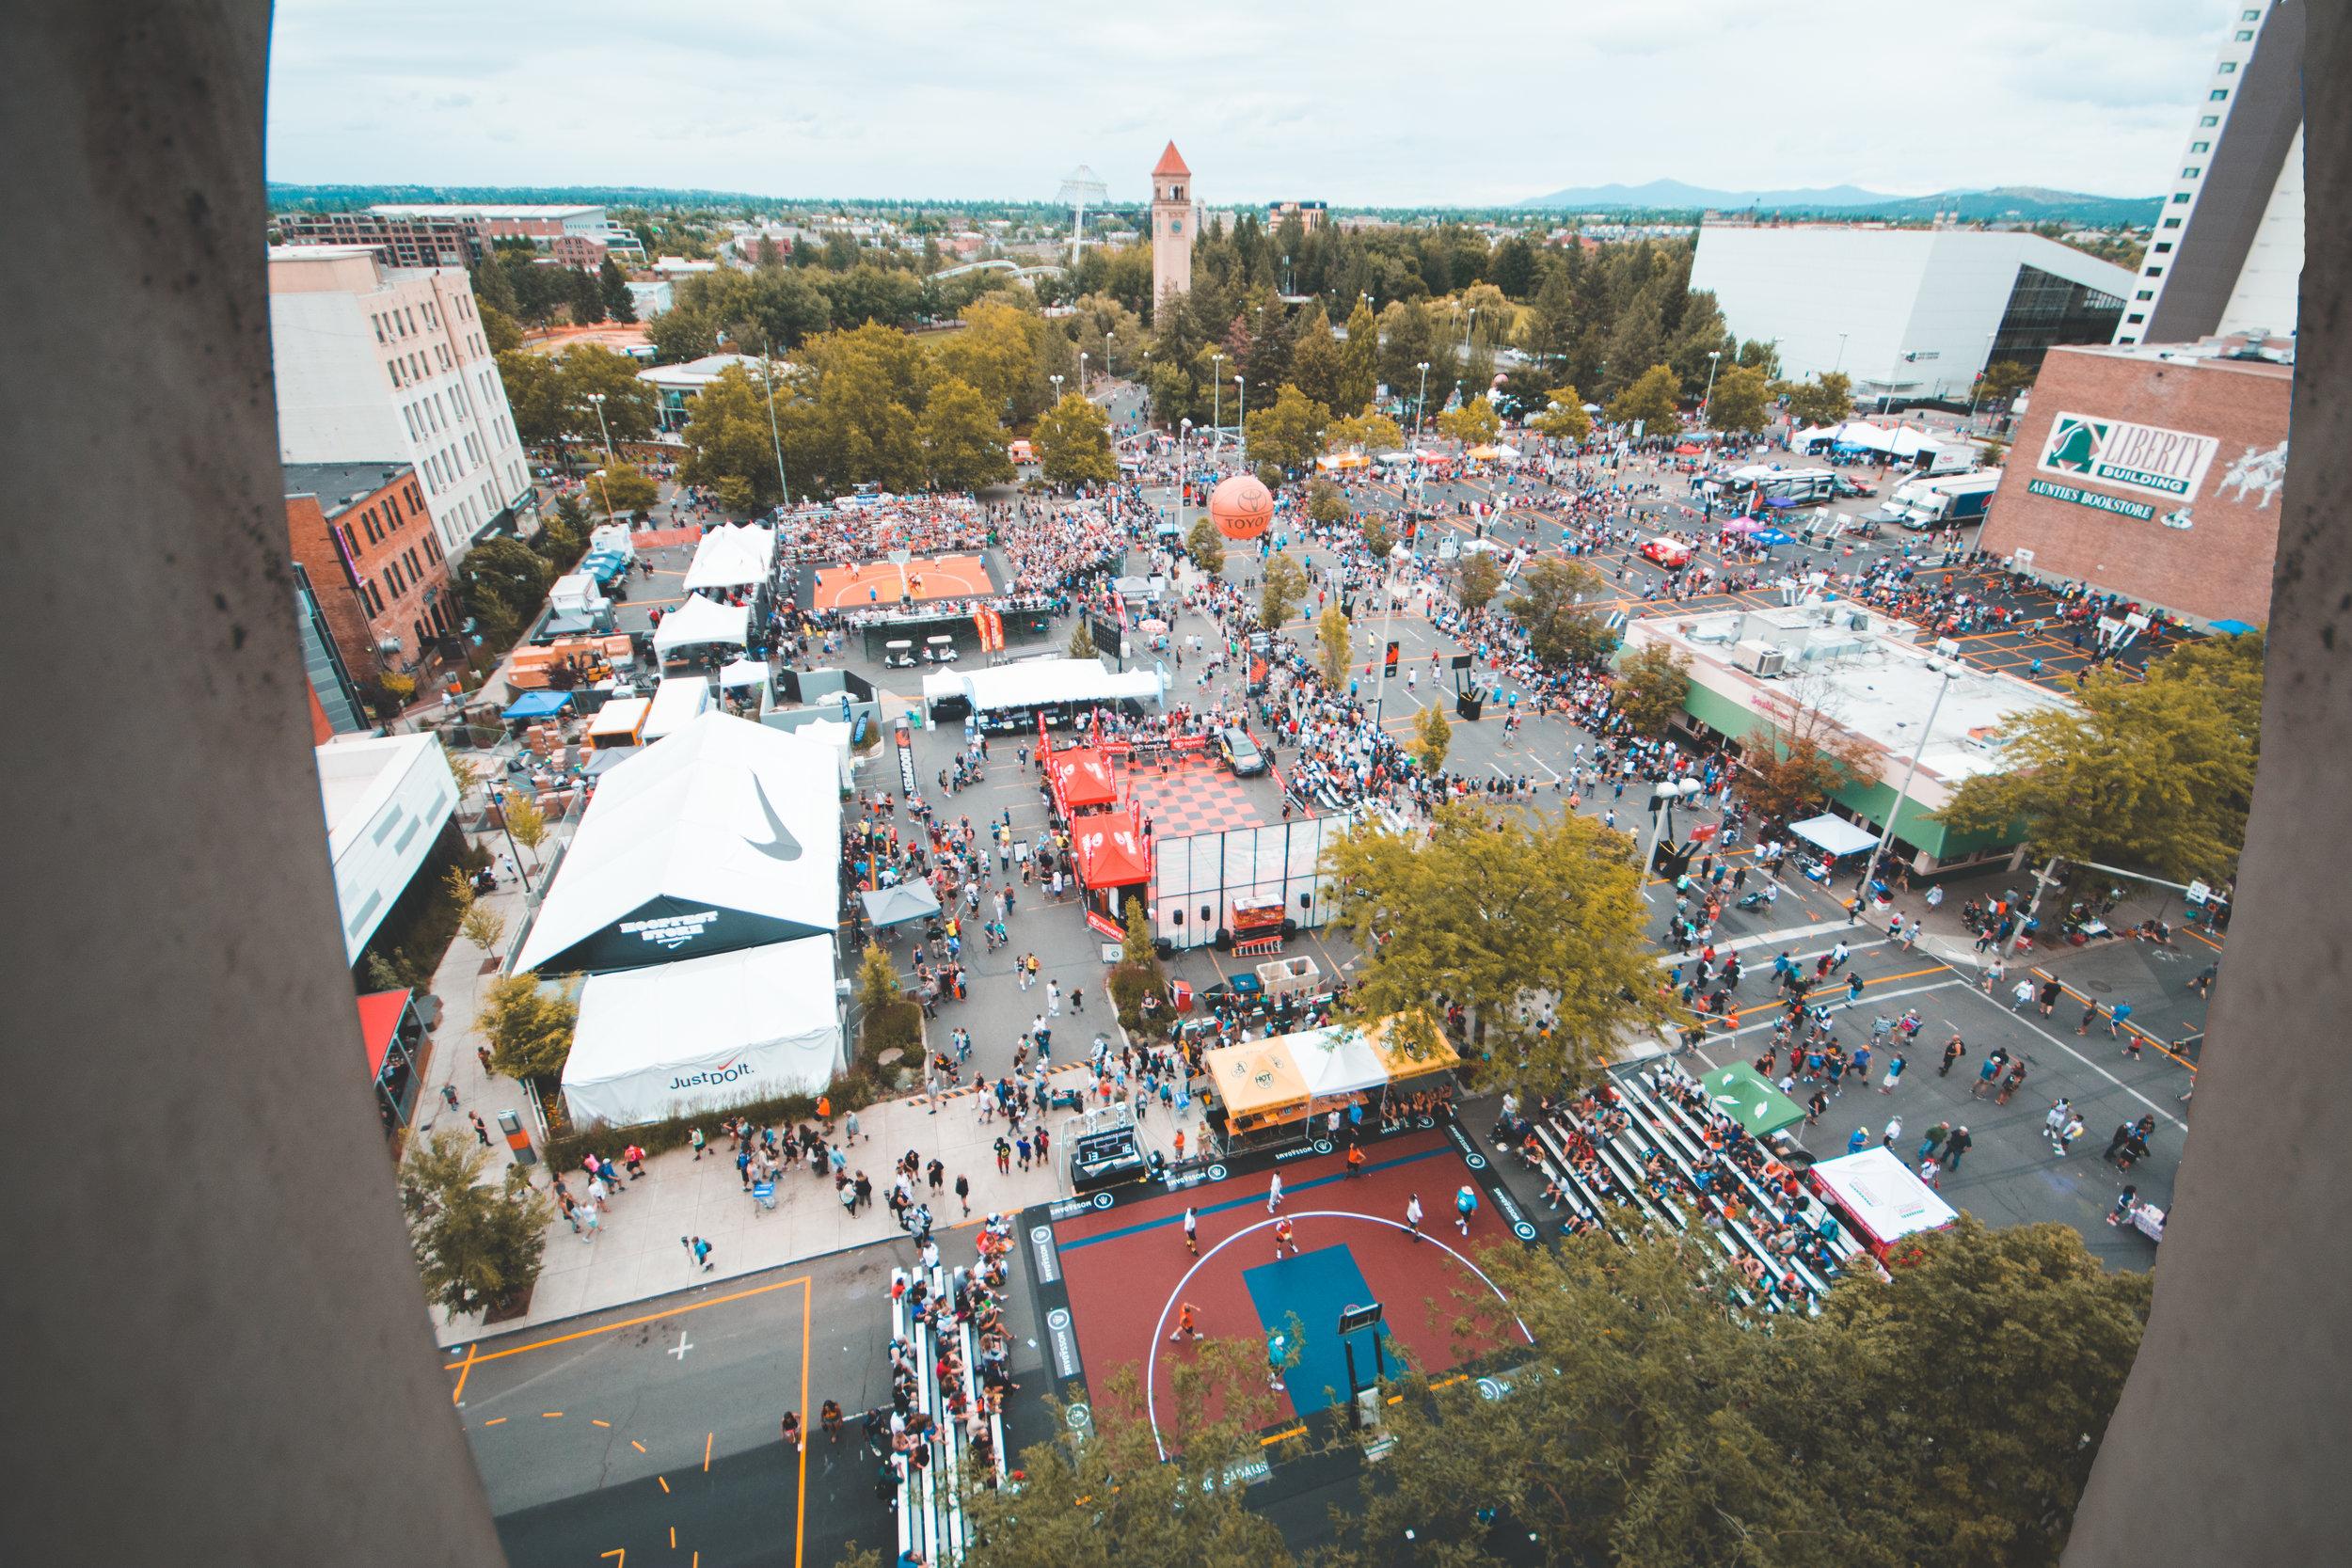 hoopfest-spokane-washington-hooptown-usa